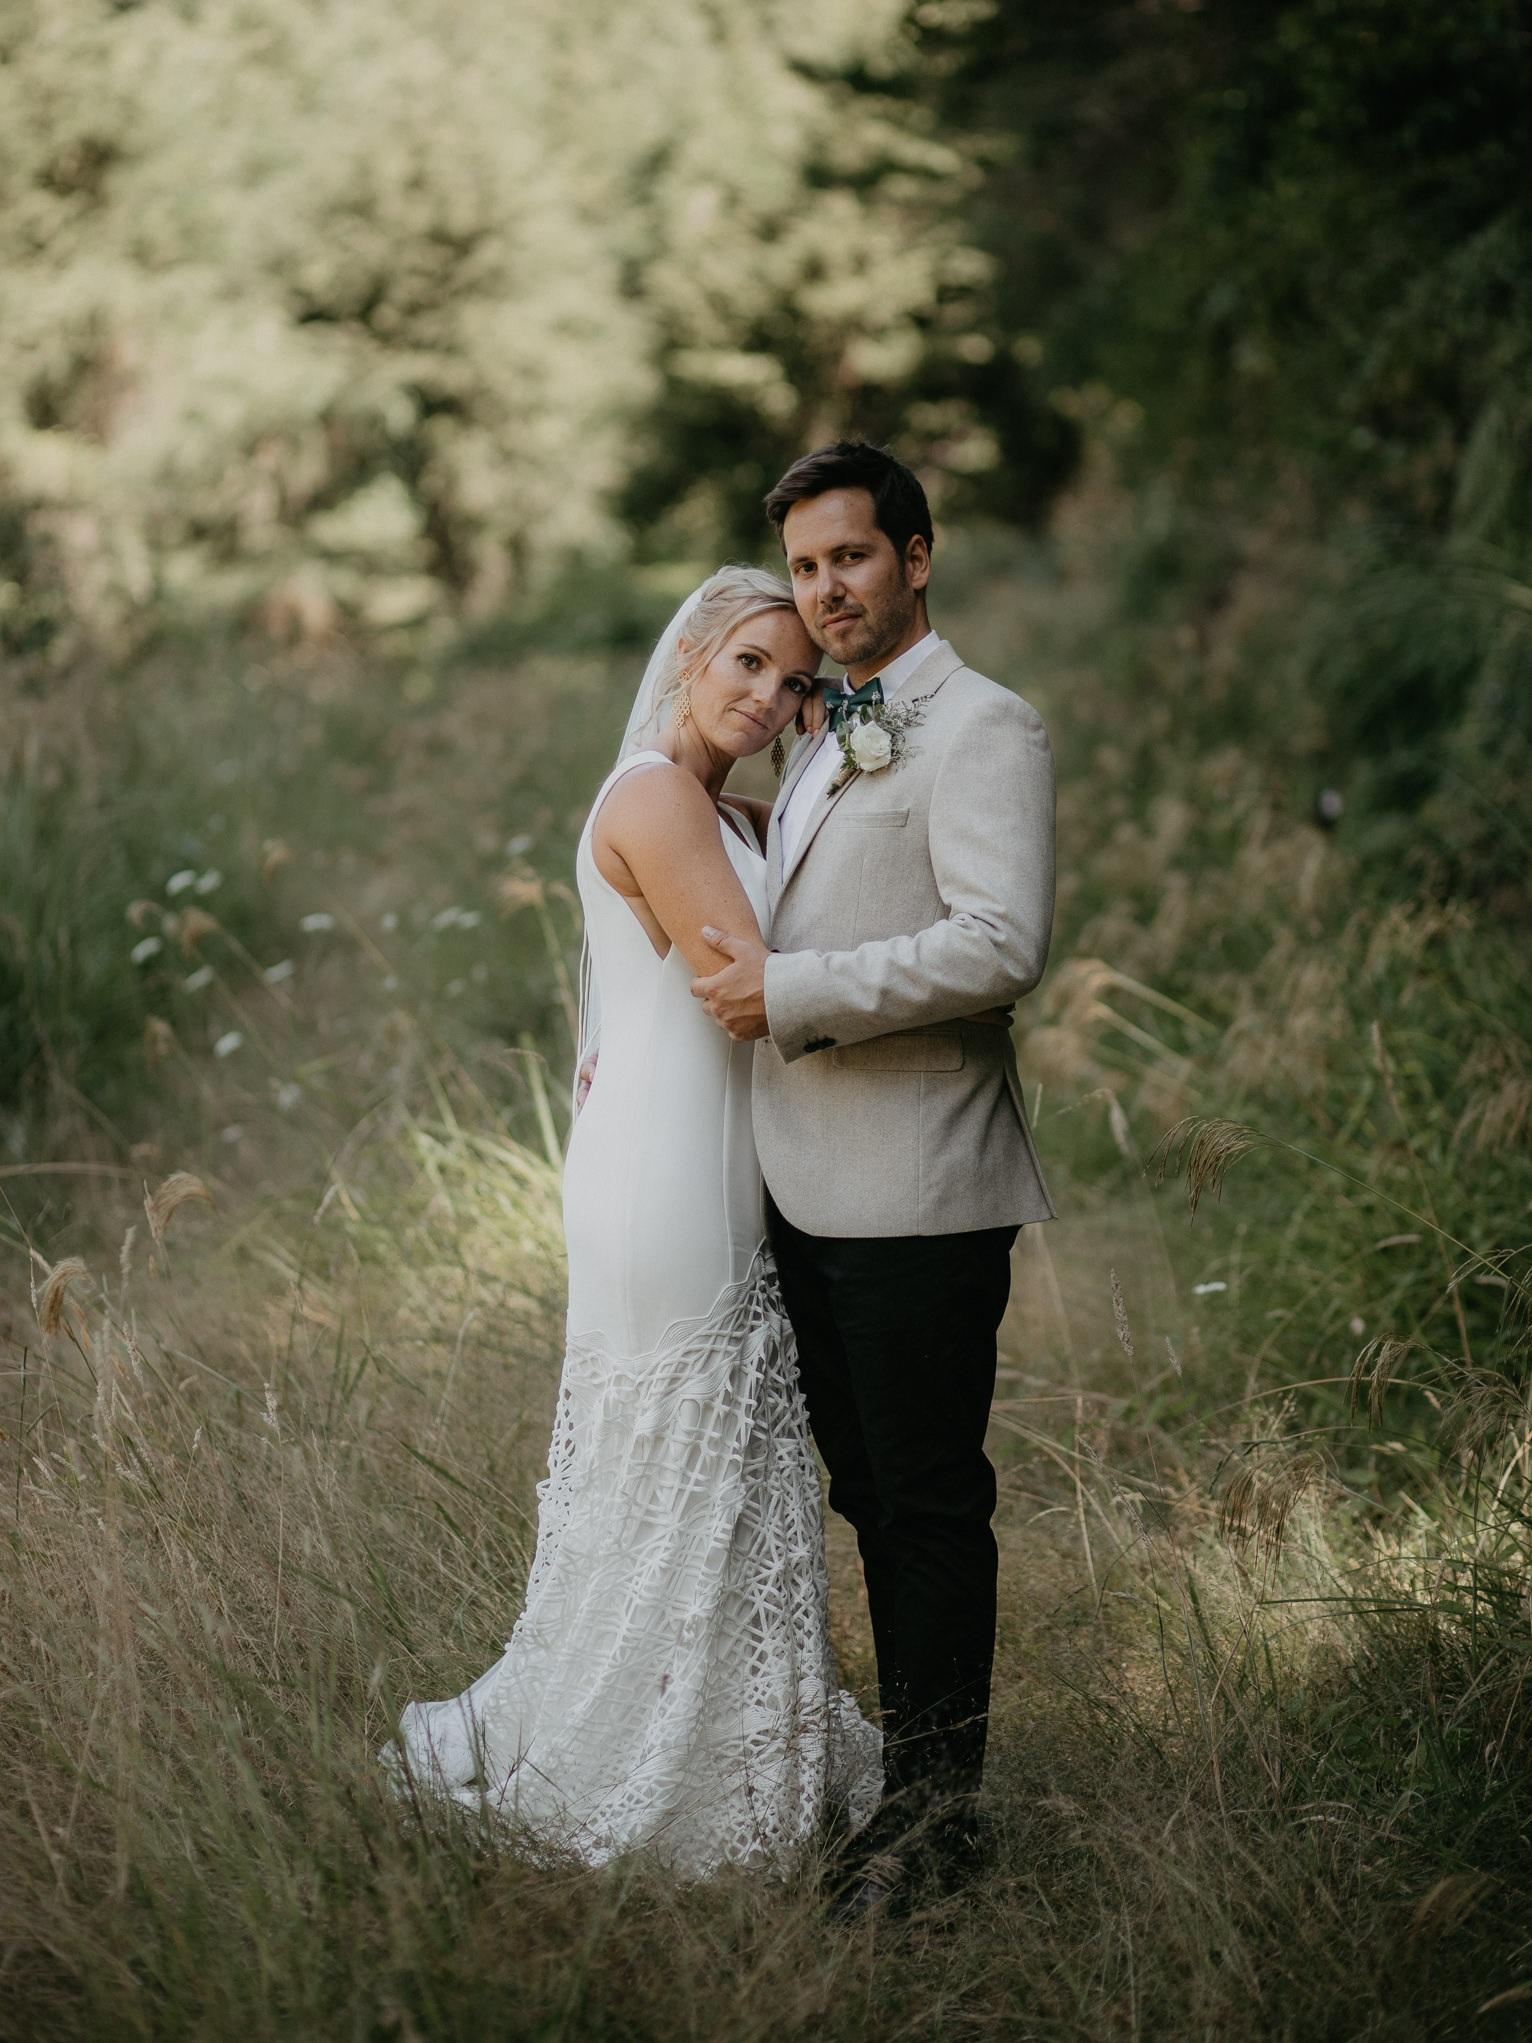 oldforestschool-wedding-blog-82.jpg